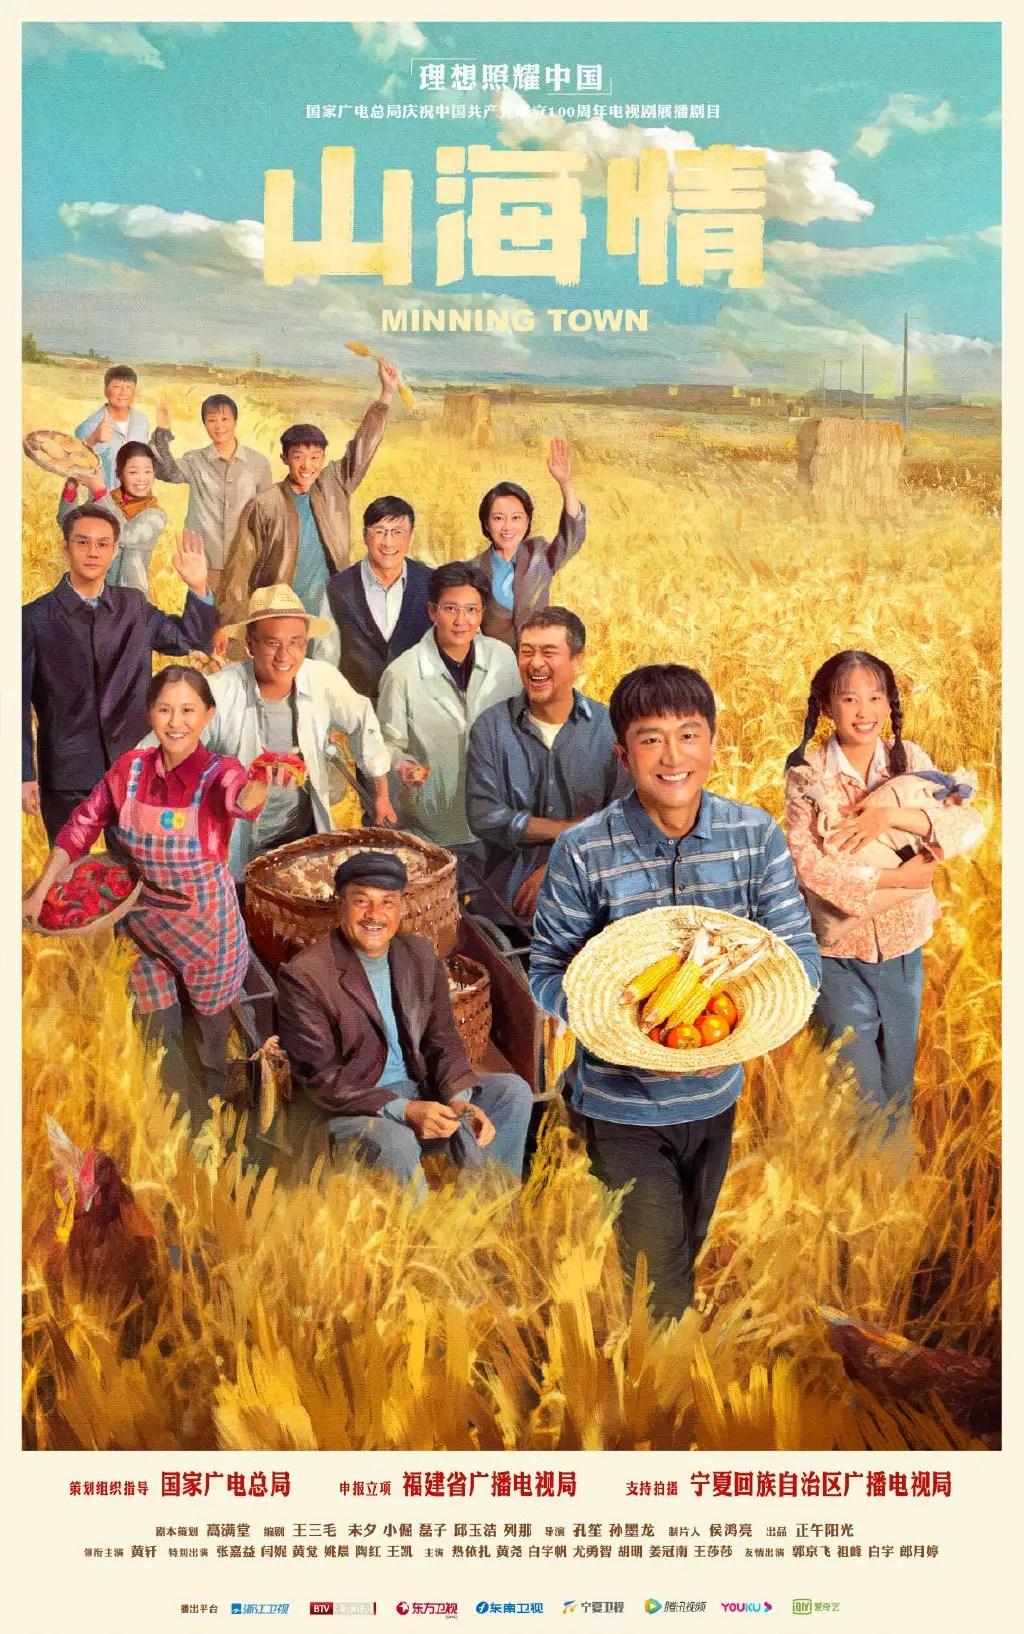 Minning Town Chinese Drama Poster